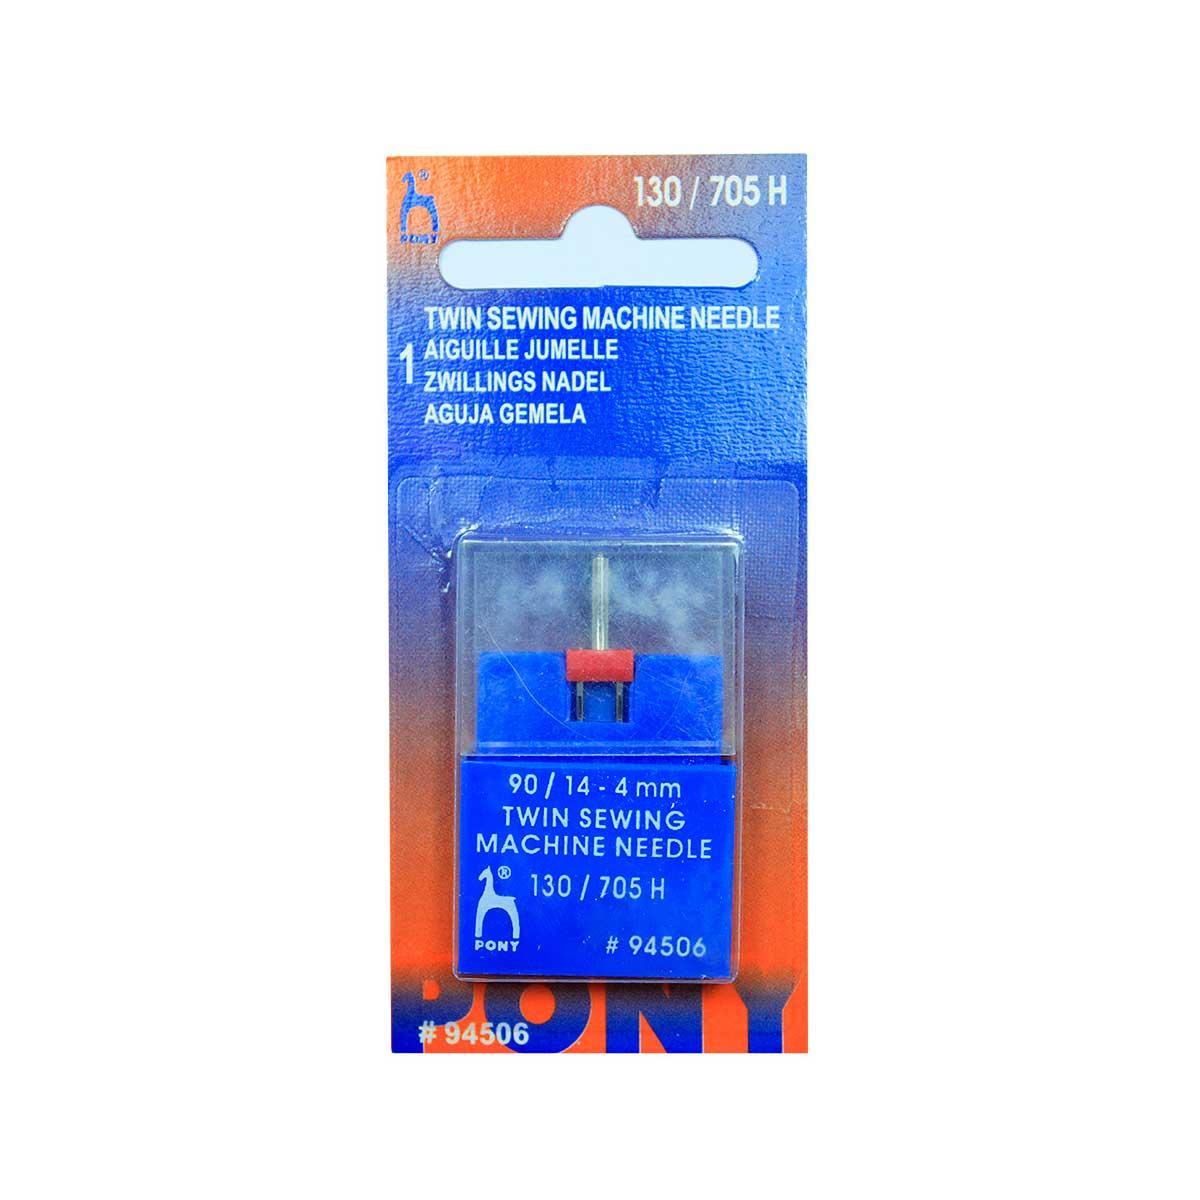 94506 Игла машинная двойная № 90, 4,00 мм, 1 шт PONY